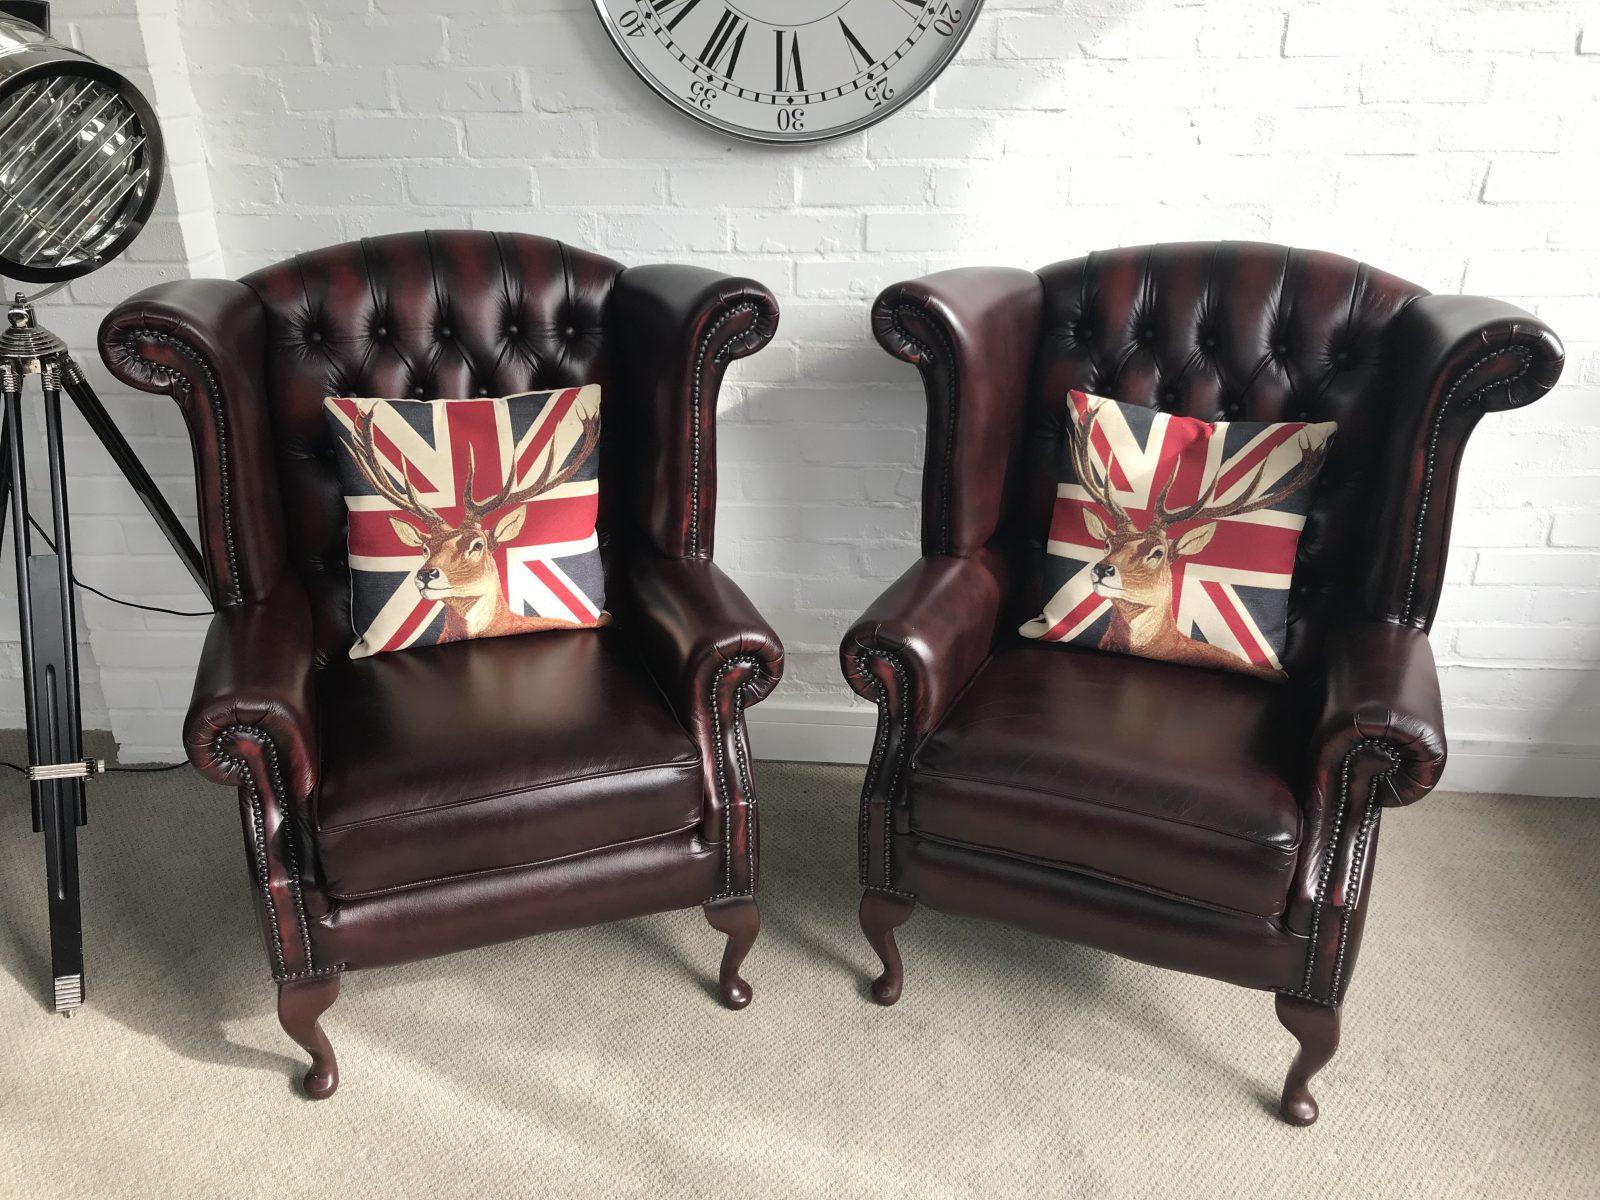 Pair Of Matching Thomas Lloyd Wingback Chairs.